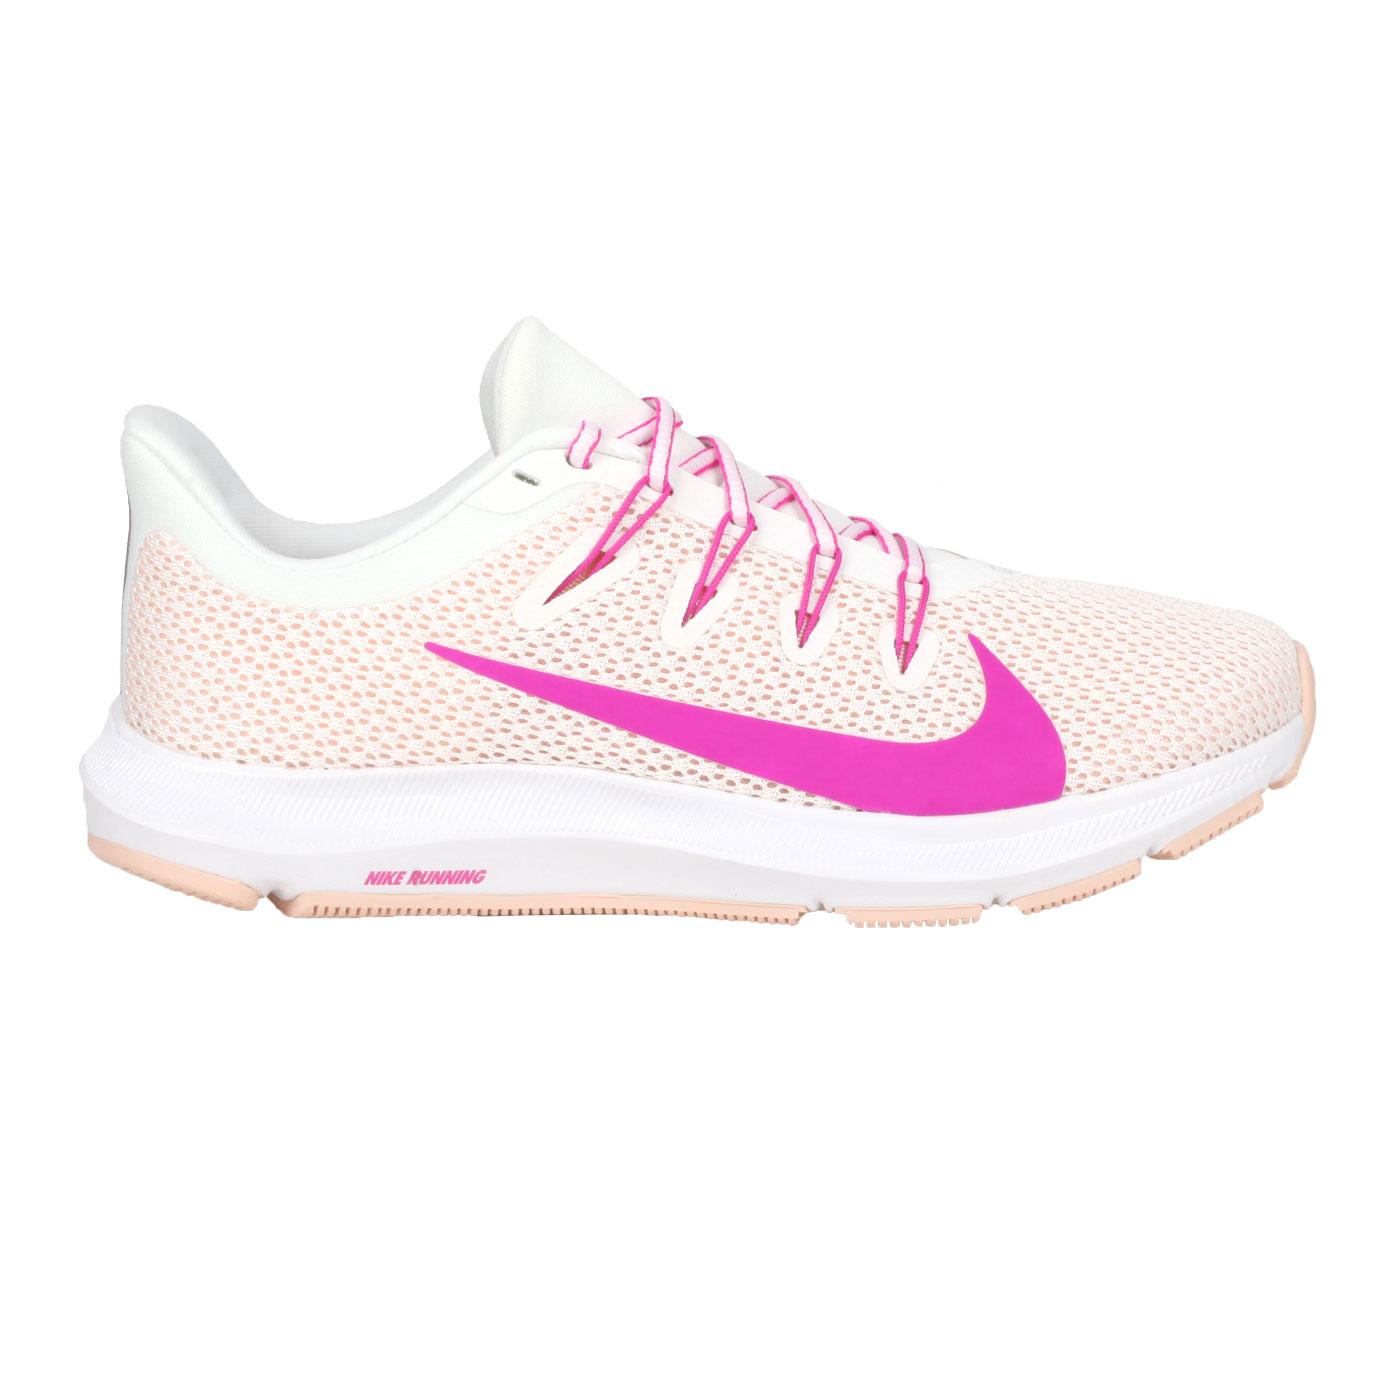 NIKE 女款休閒慢跑鞋  @WMNS  QUEST 2@CI3803004 - 白粉紫